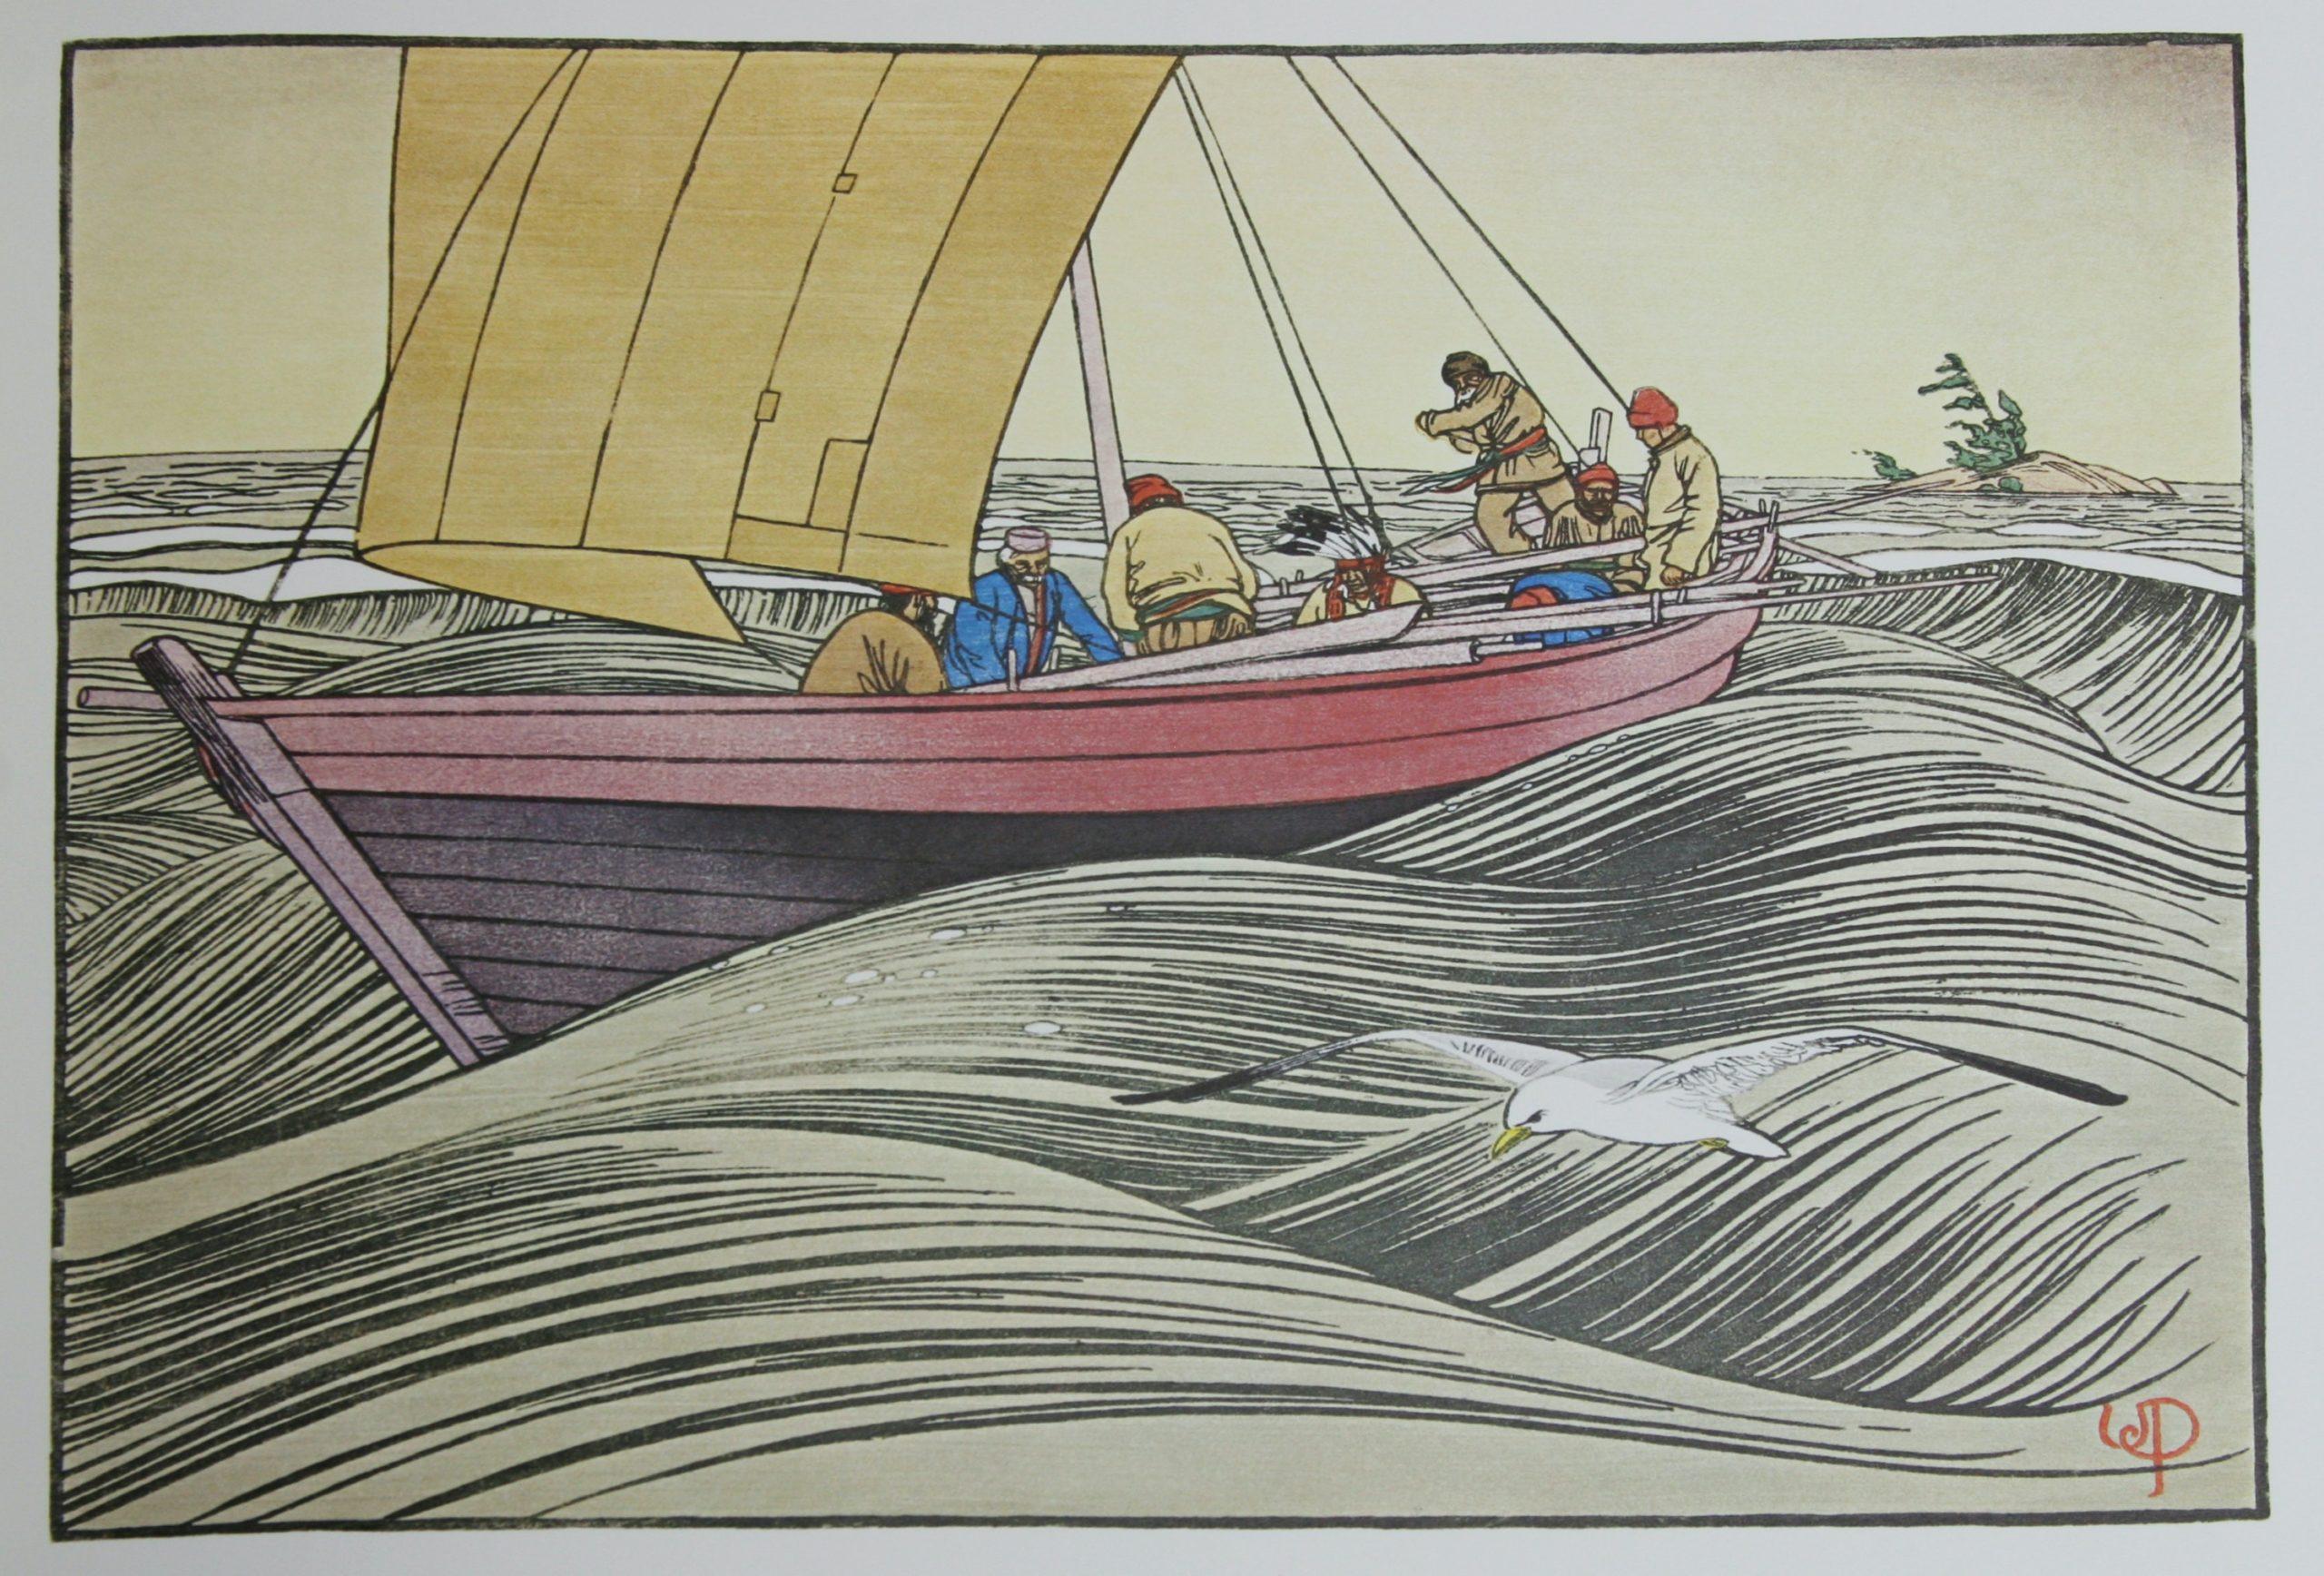 York Boat on Lake Winnipeg by WJ Phillips